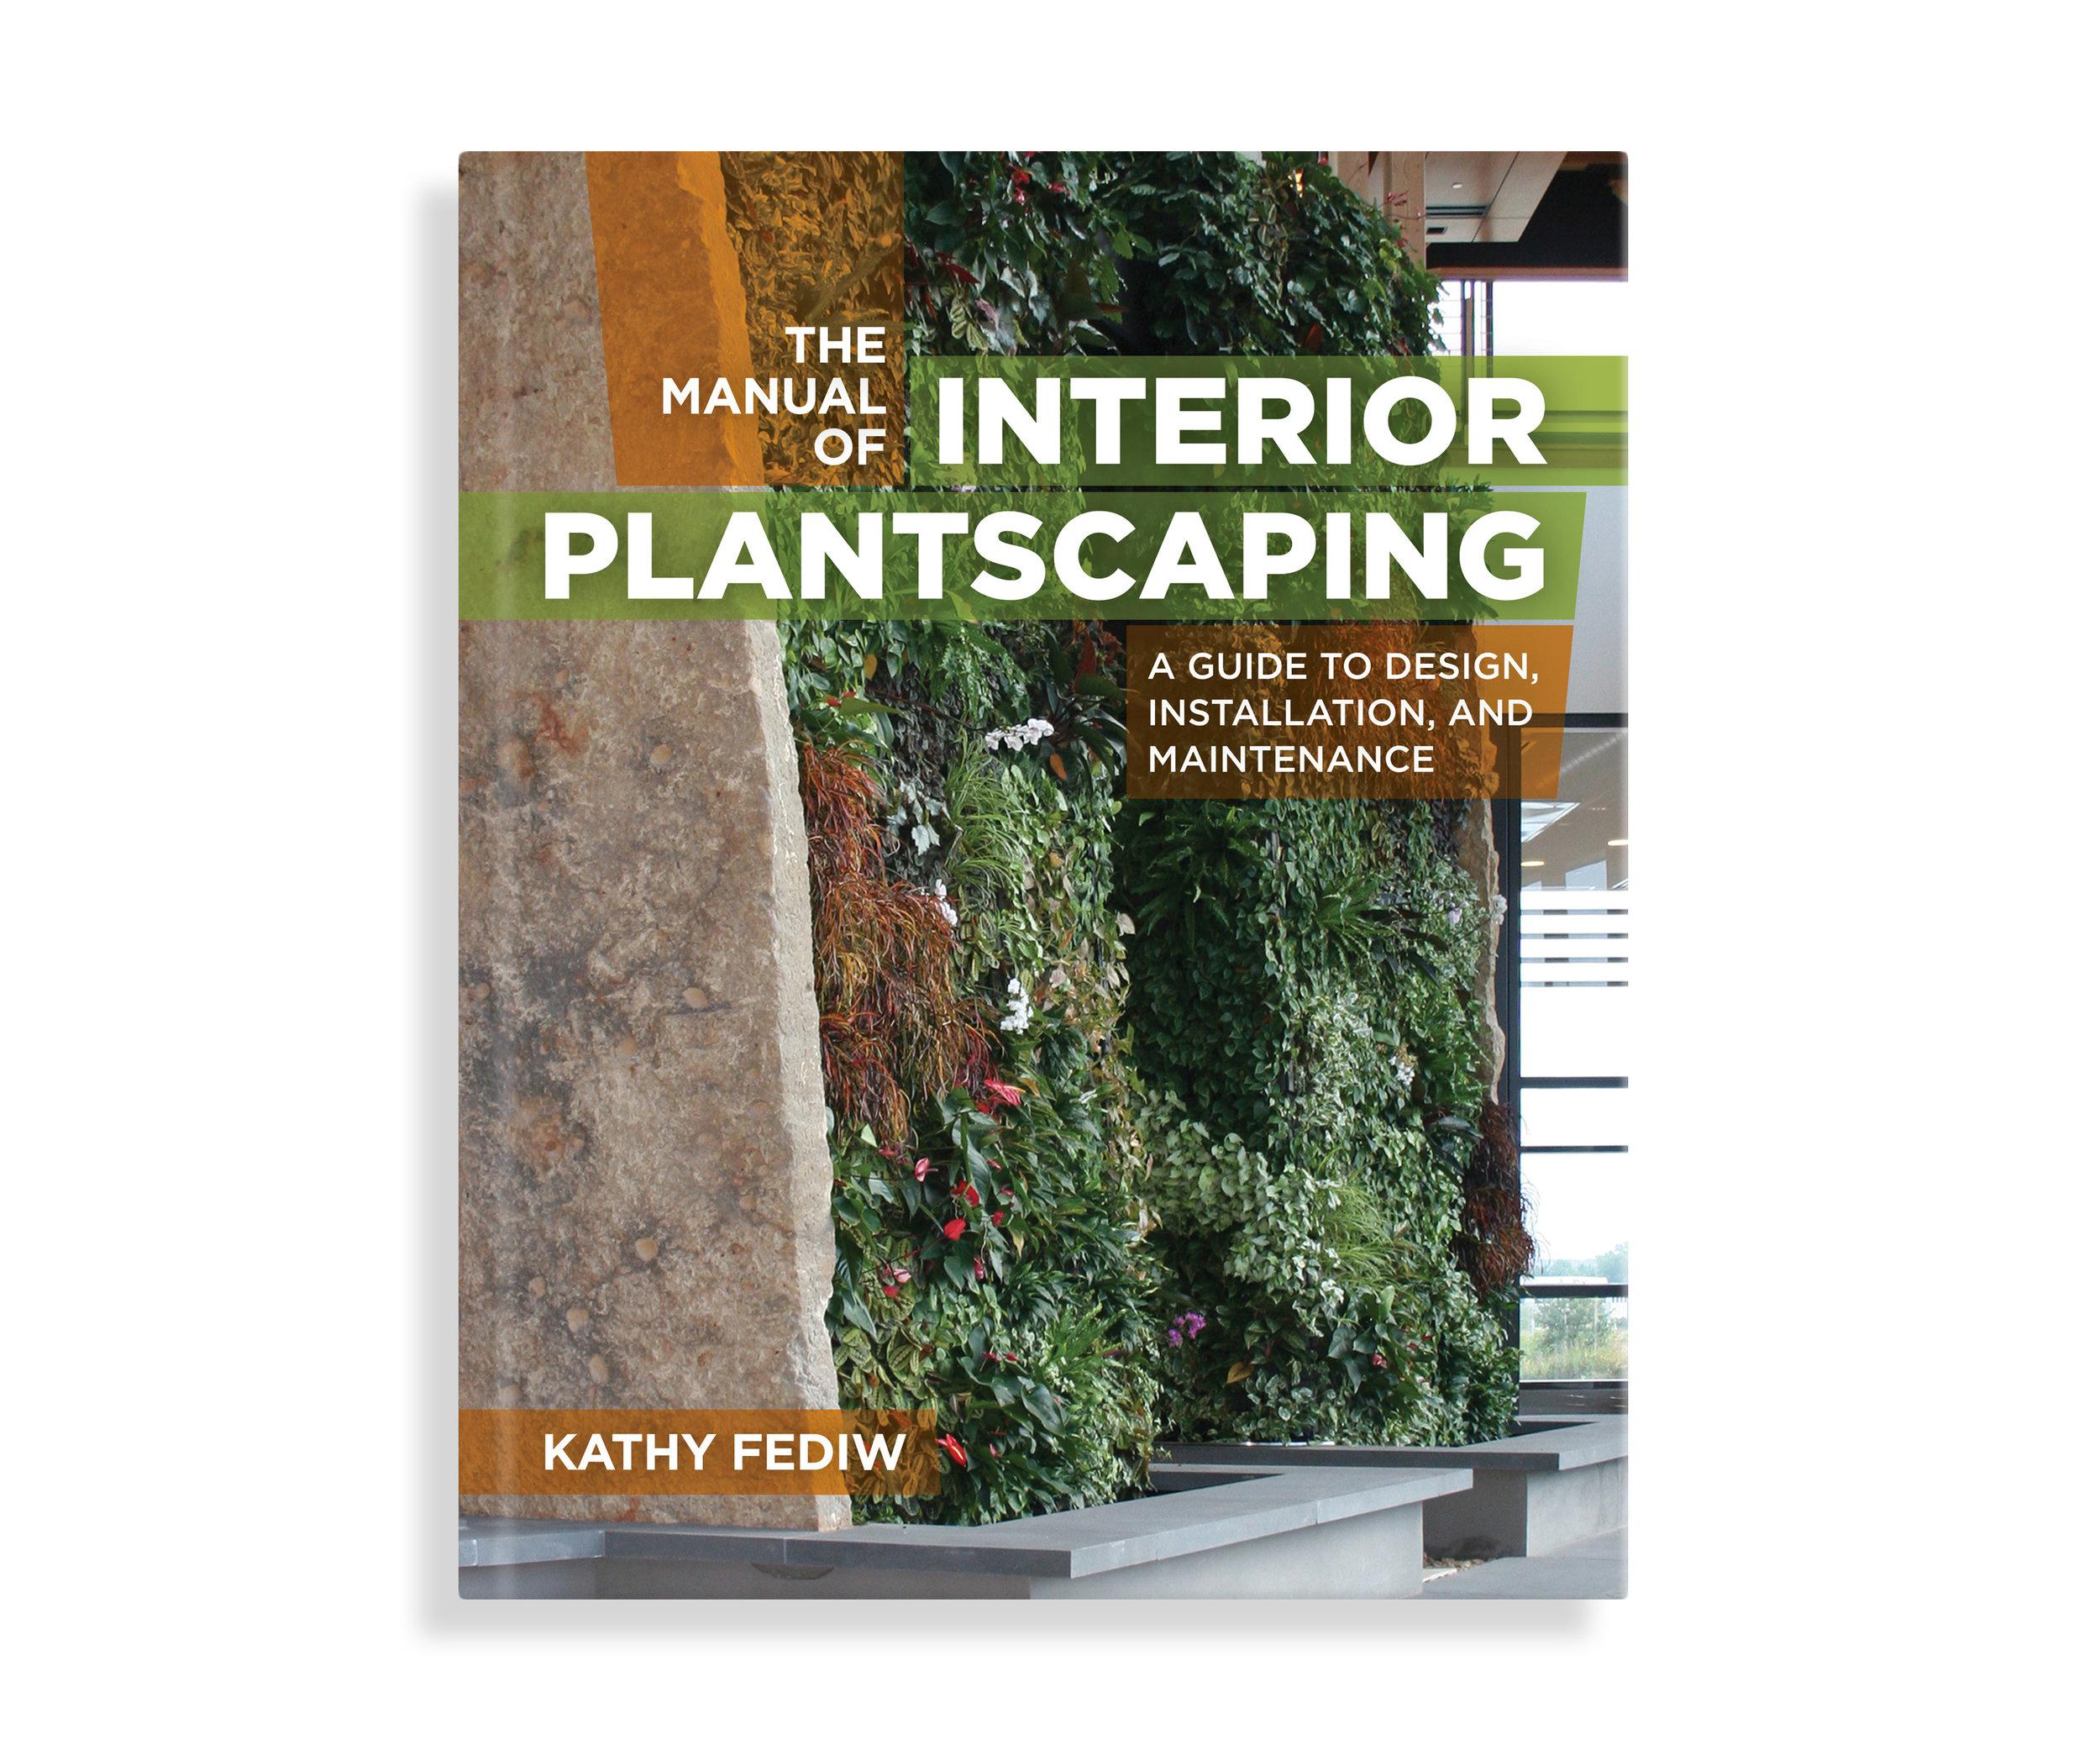 book_interiorplantscaping_cover_001.jpg